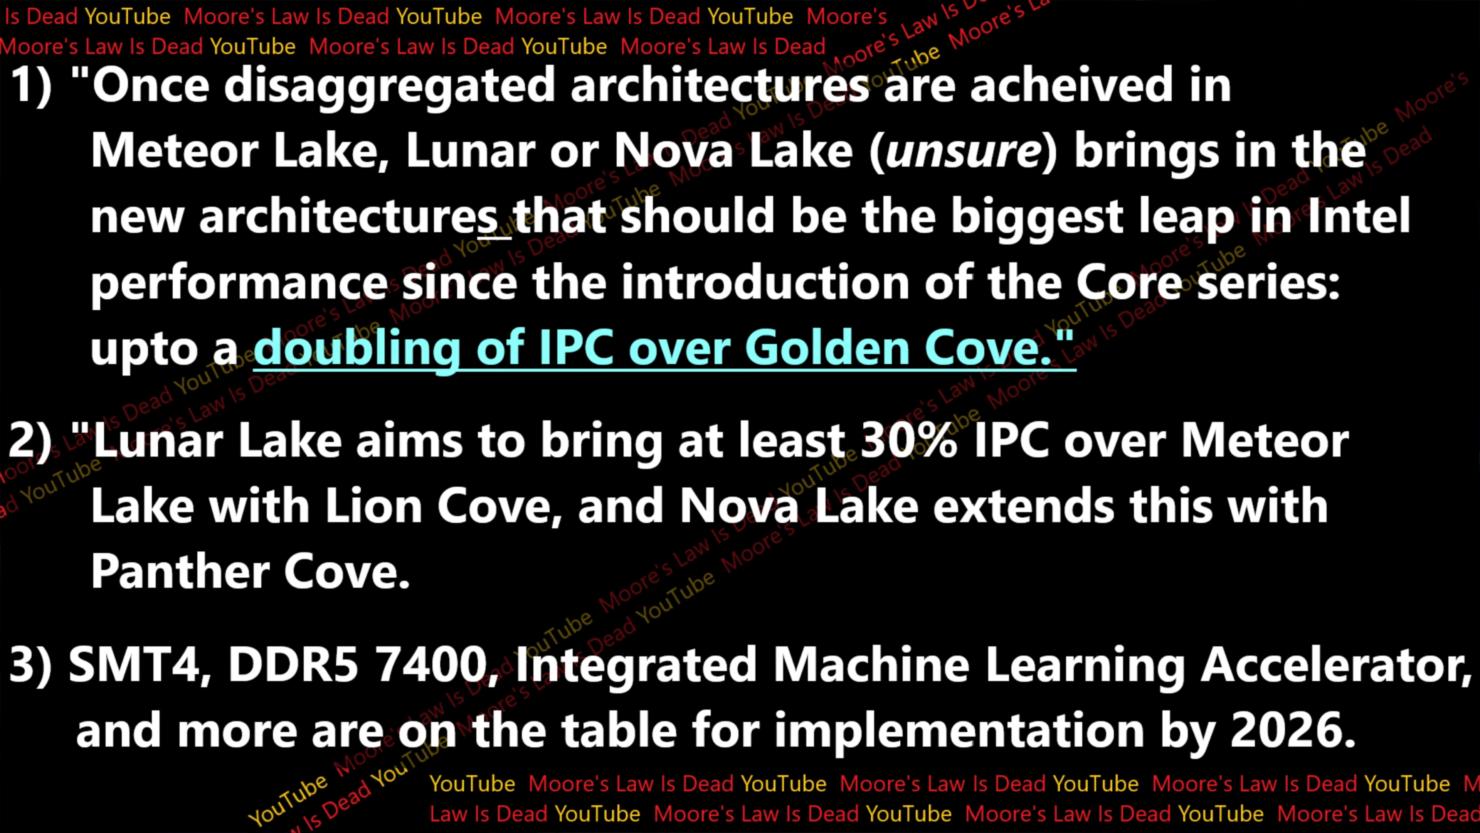 intel-royal-core-architecture-arrow-lake-lunar-lake-nova-lake-with-lion-cove-and-panther-cove-cores-_2